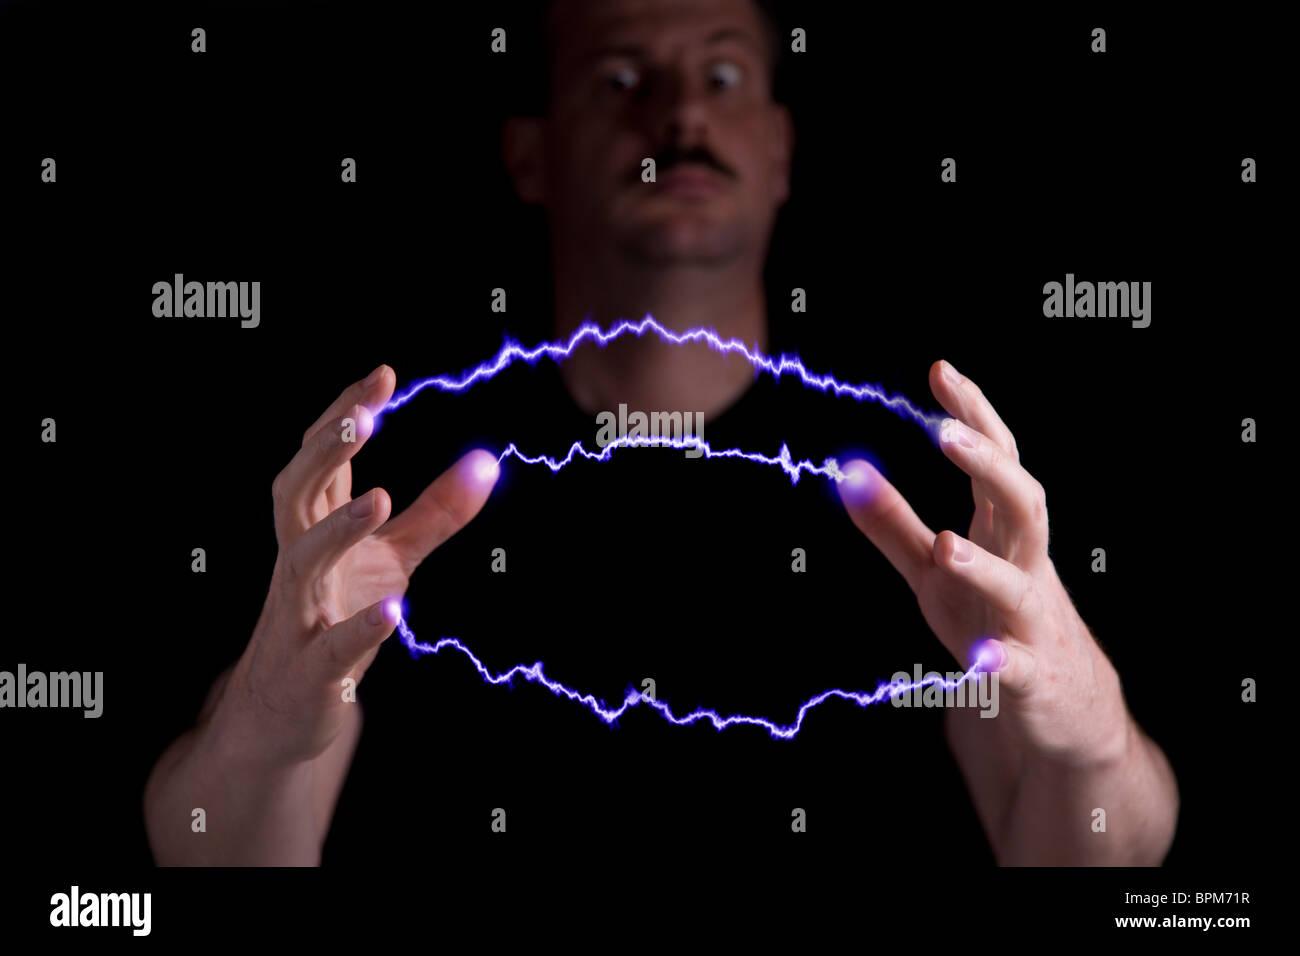 Mad scientist - Stock Image